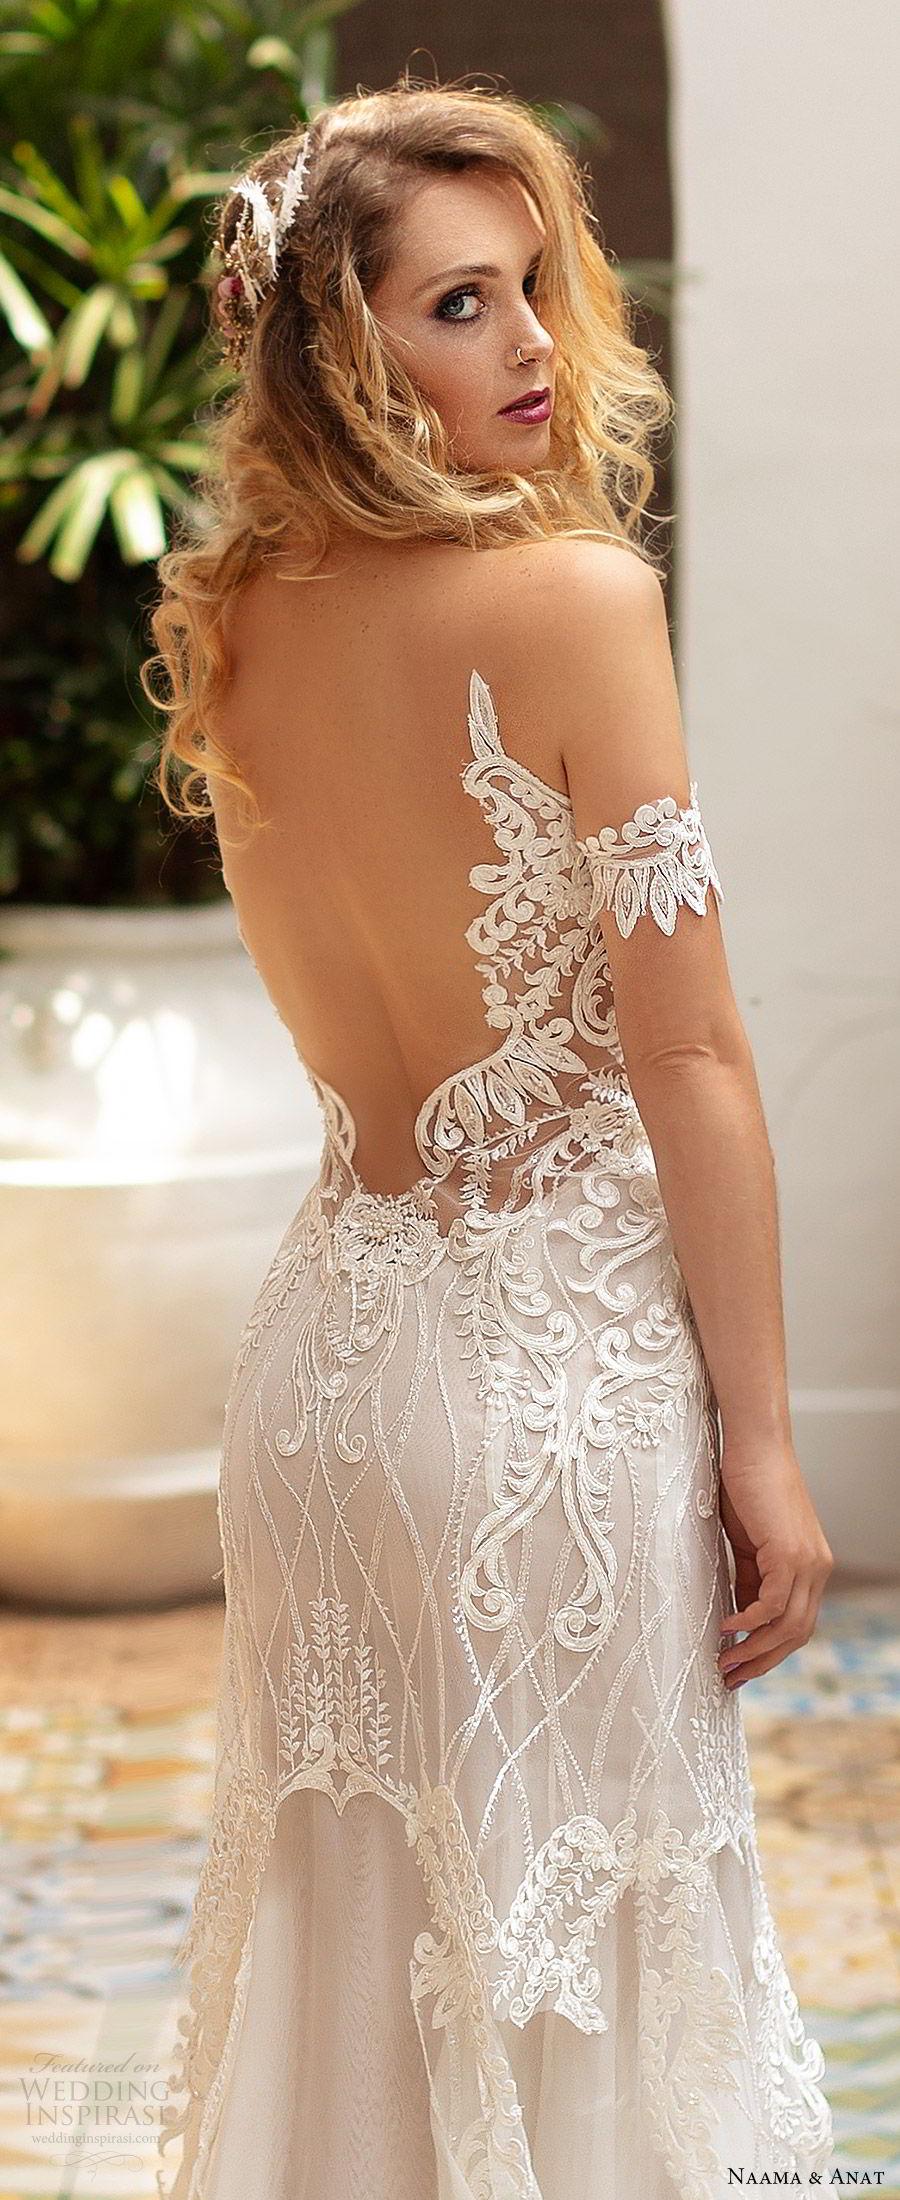 naama anat 2019 bridal off shoulder plunging sweetheart neckline embellished bodice fit flare lace wedding dress sweep train modern romantic (2) zbv